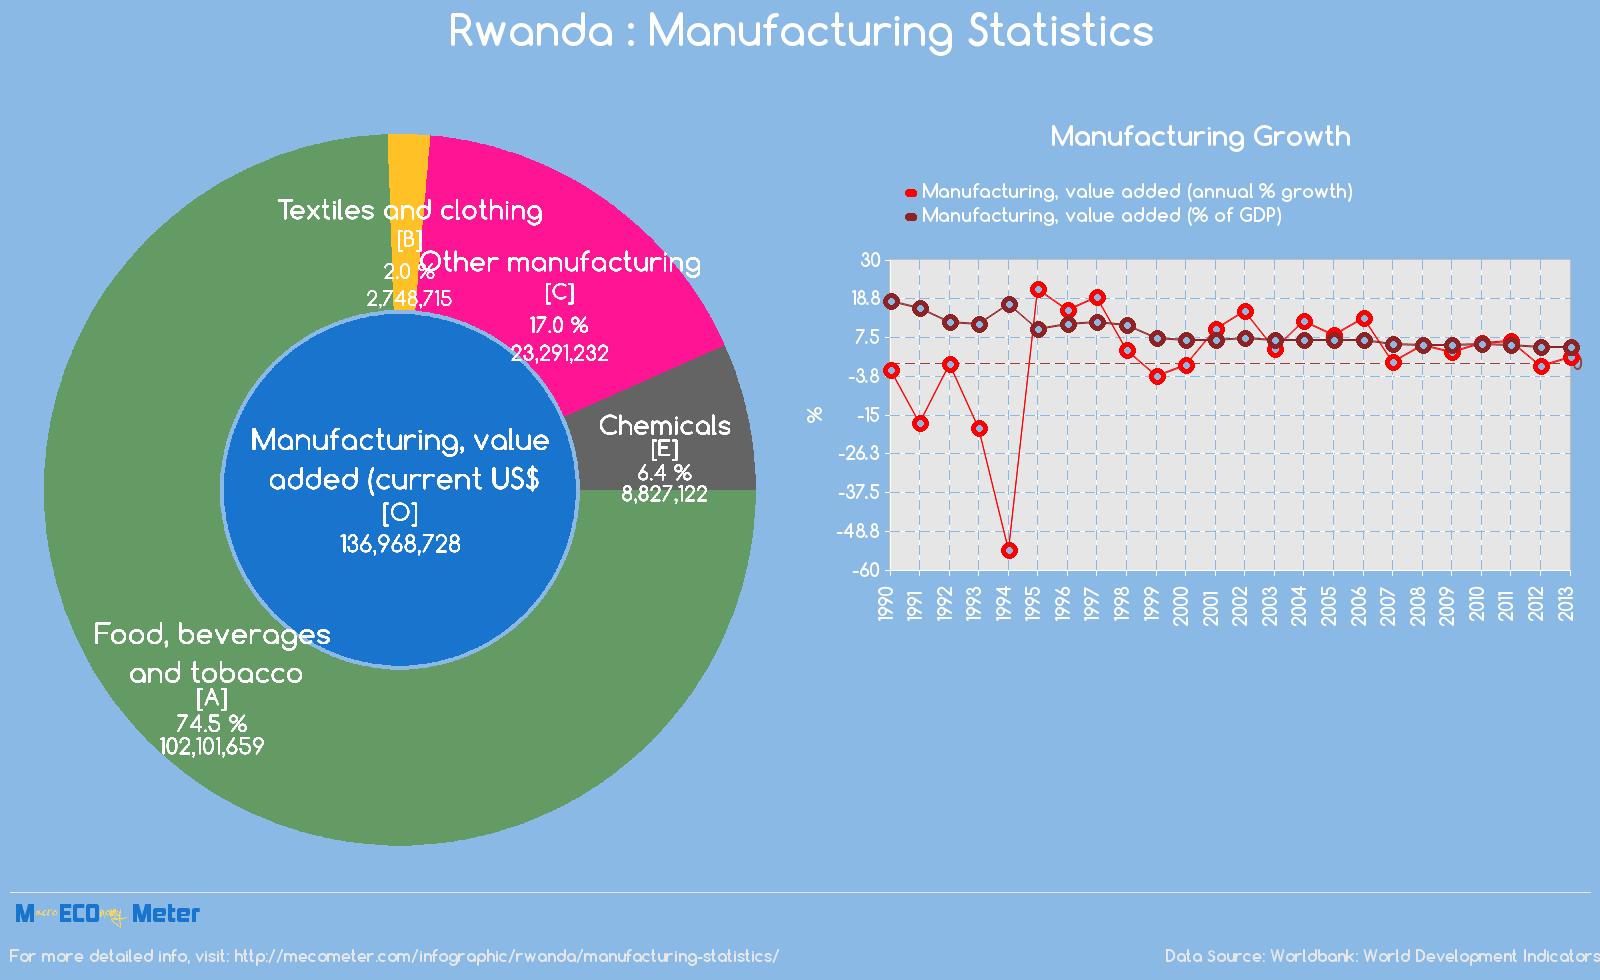 Rwanda : Manufacturing Statistics